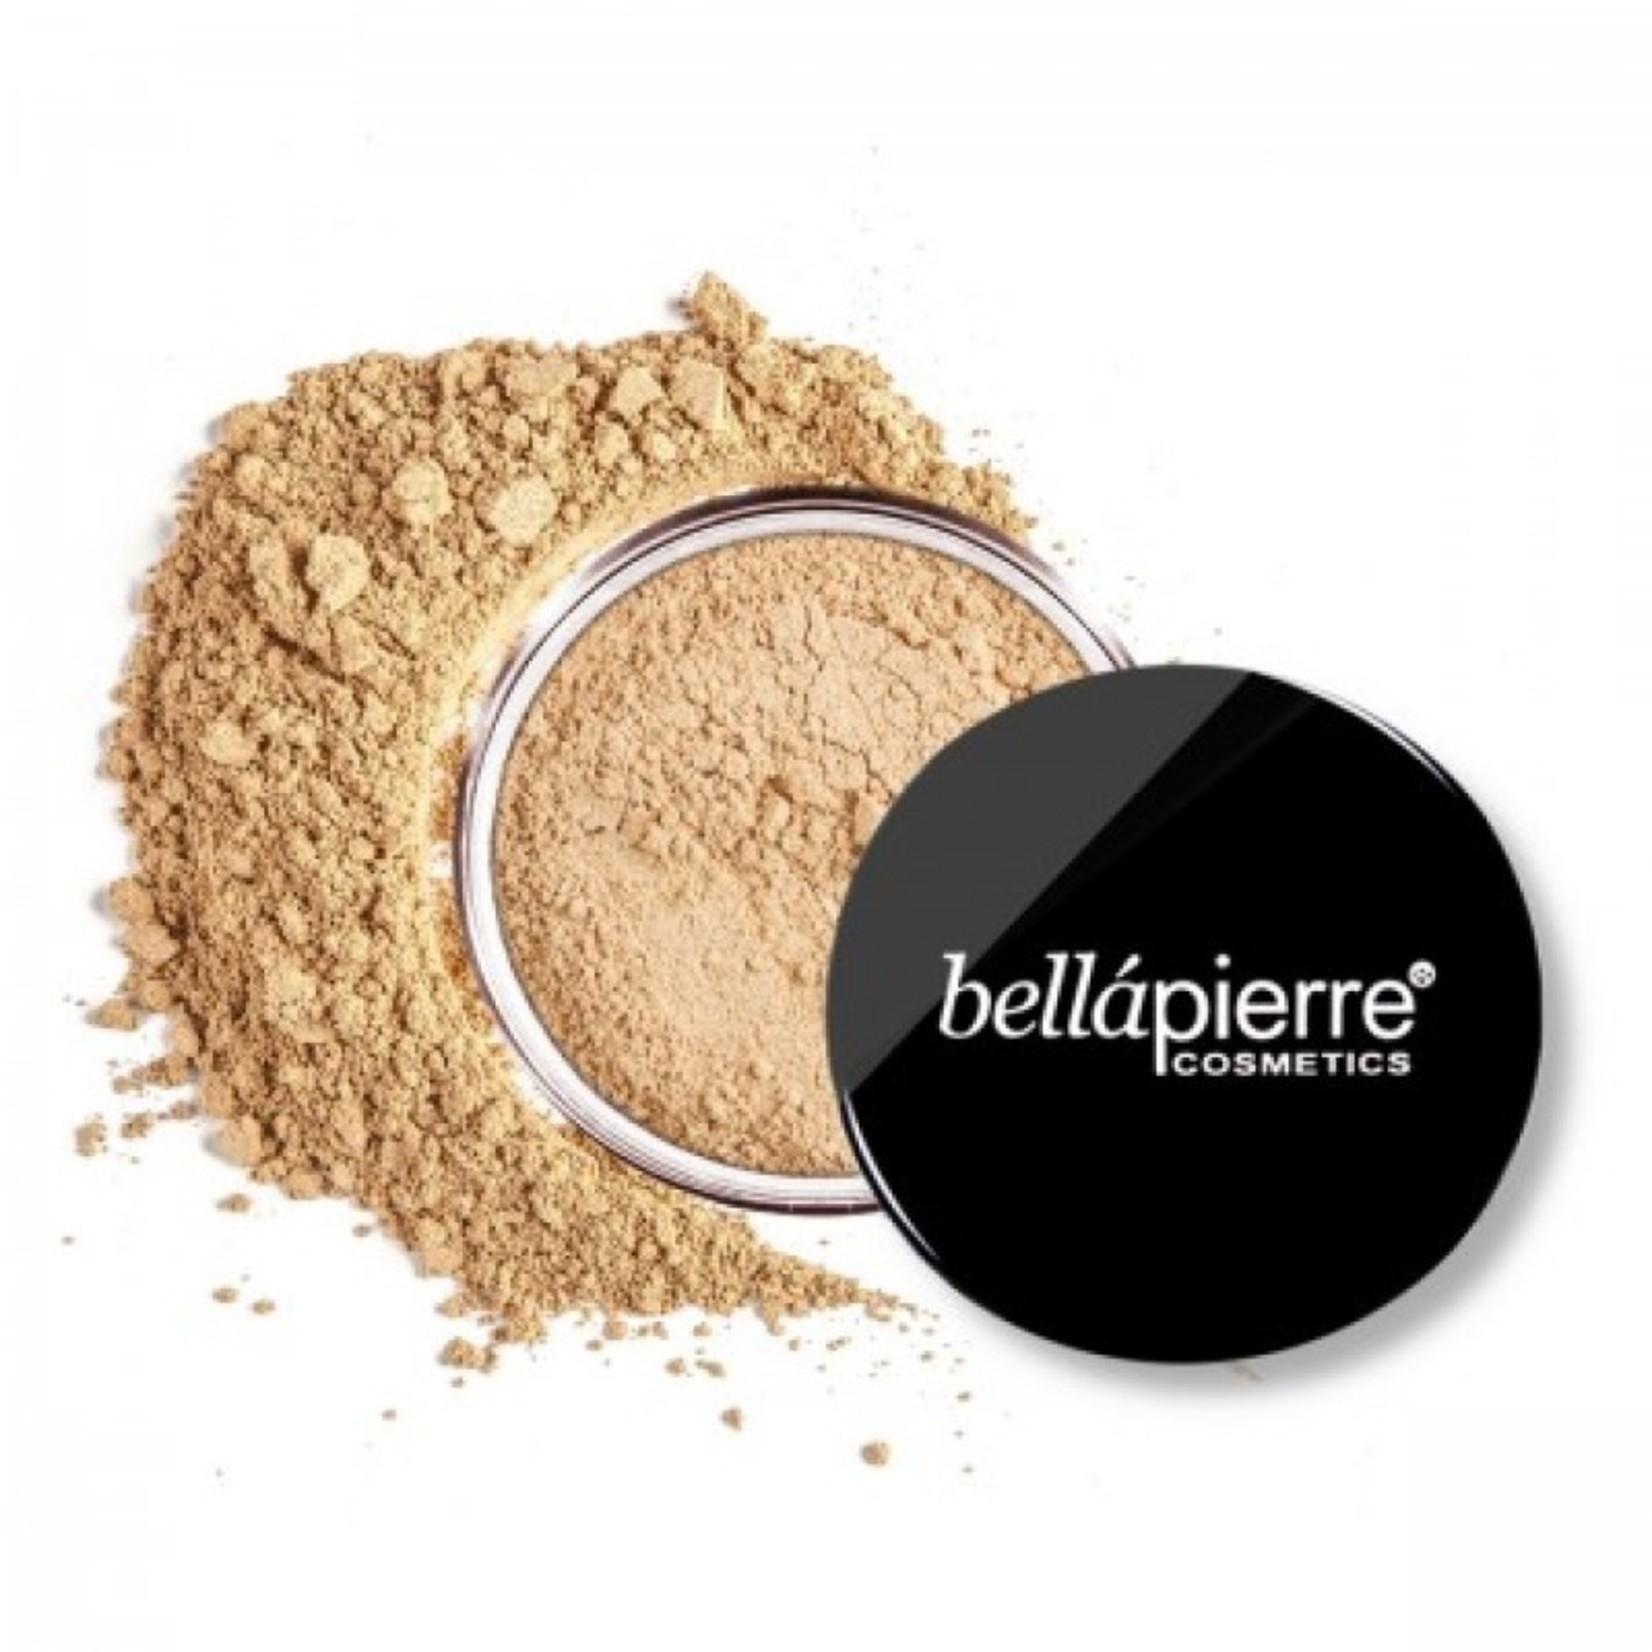 Bellapierre Mineral loose - Foundation - Cinnamon